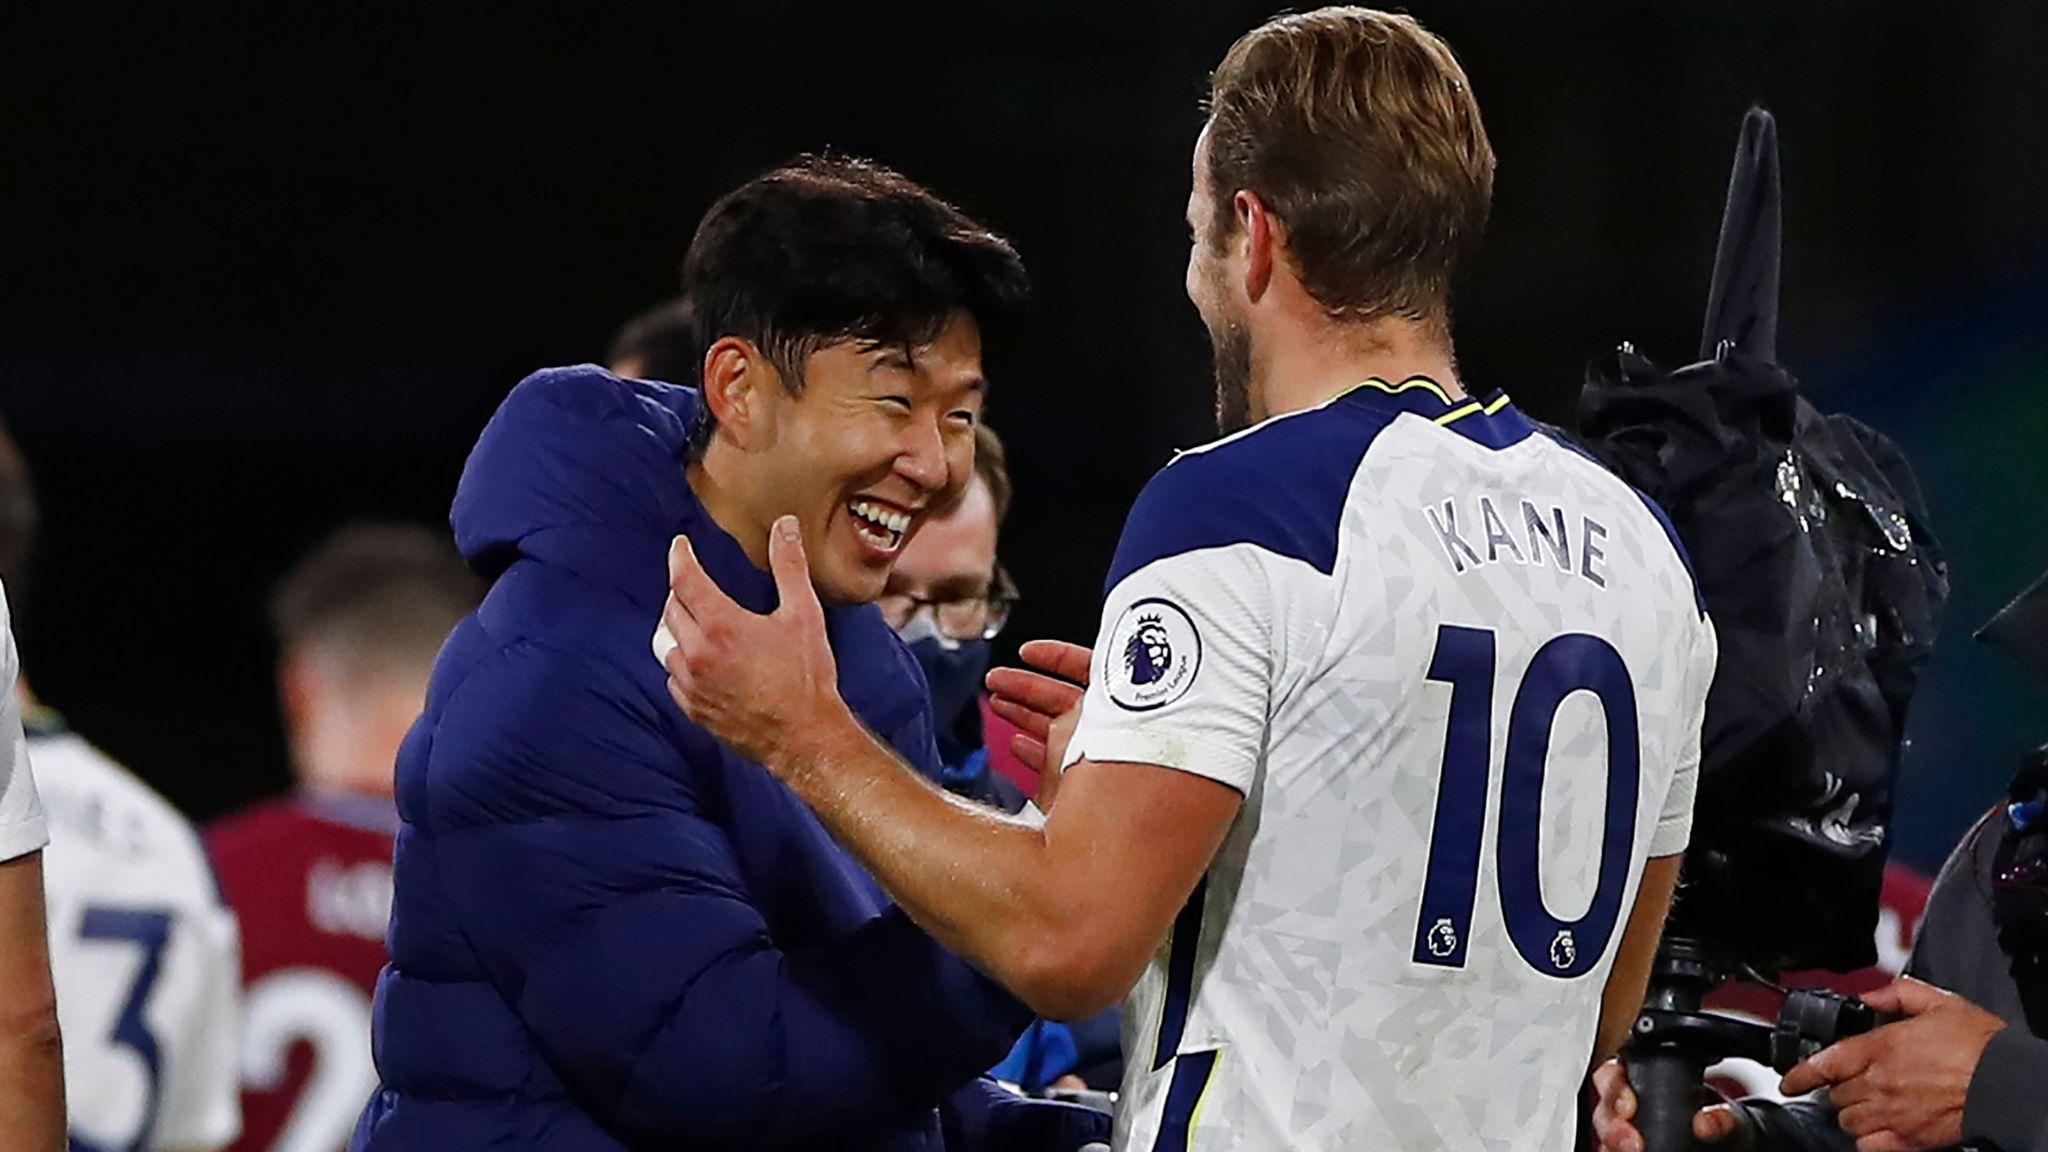 Harry Kane and Heung-Min Son combine again as Tottenham sink Burnley at  Turf Moor | Football News | Sky Sports